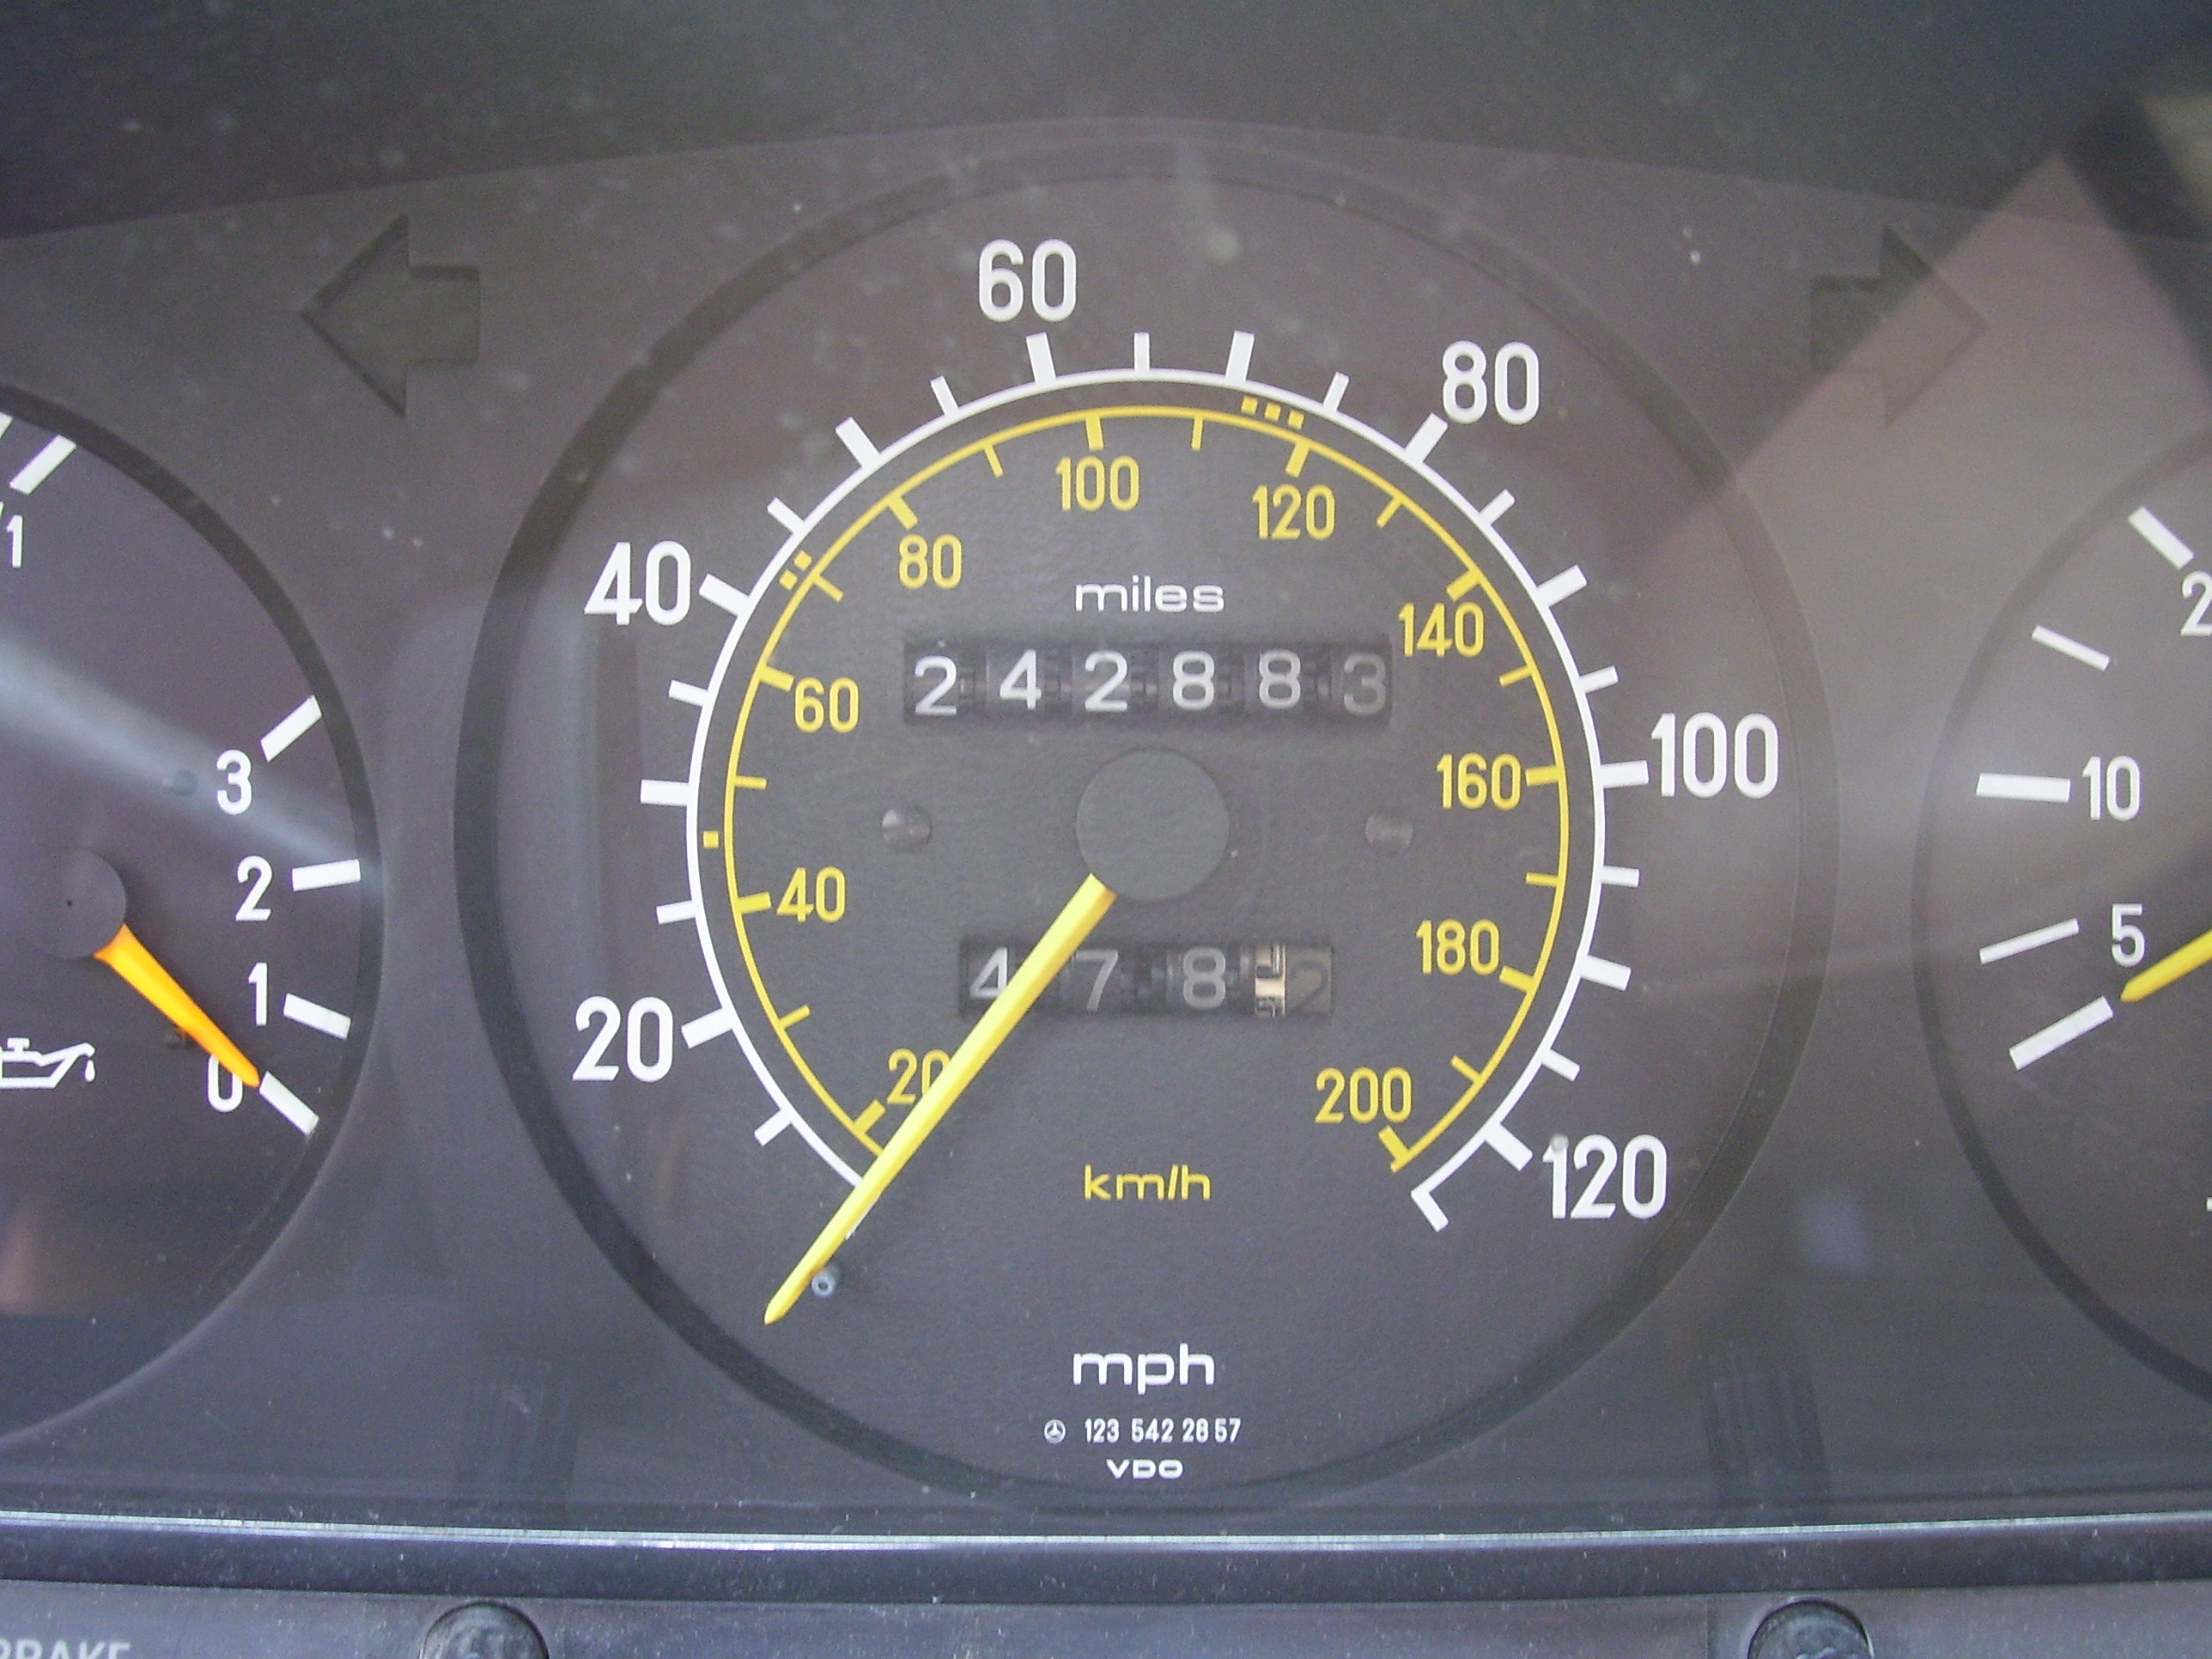 makkes accelerometer car dashboard round meter speed